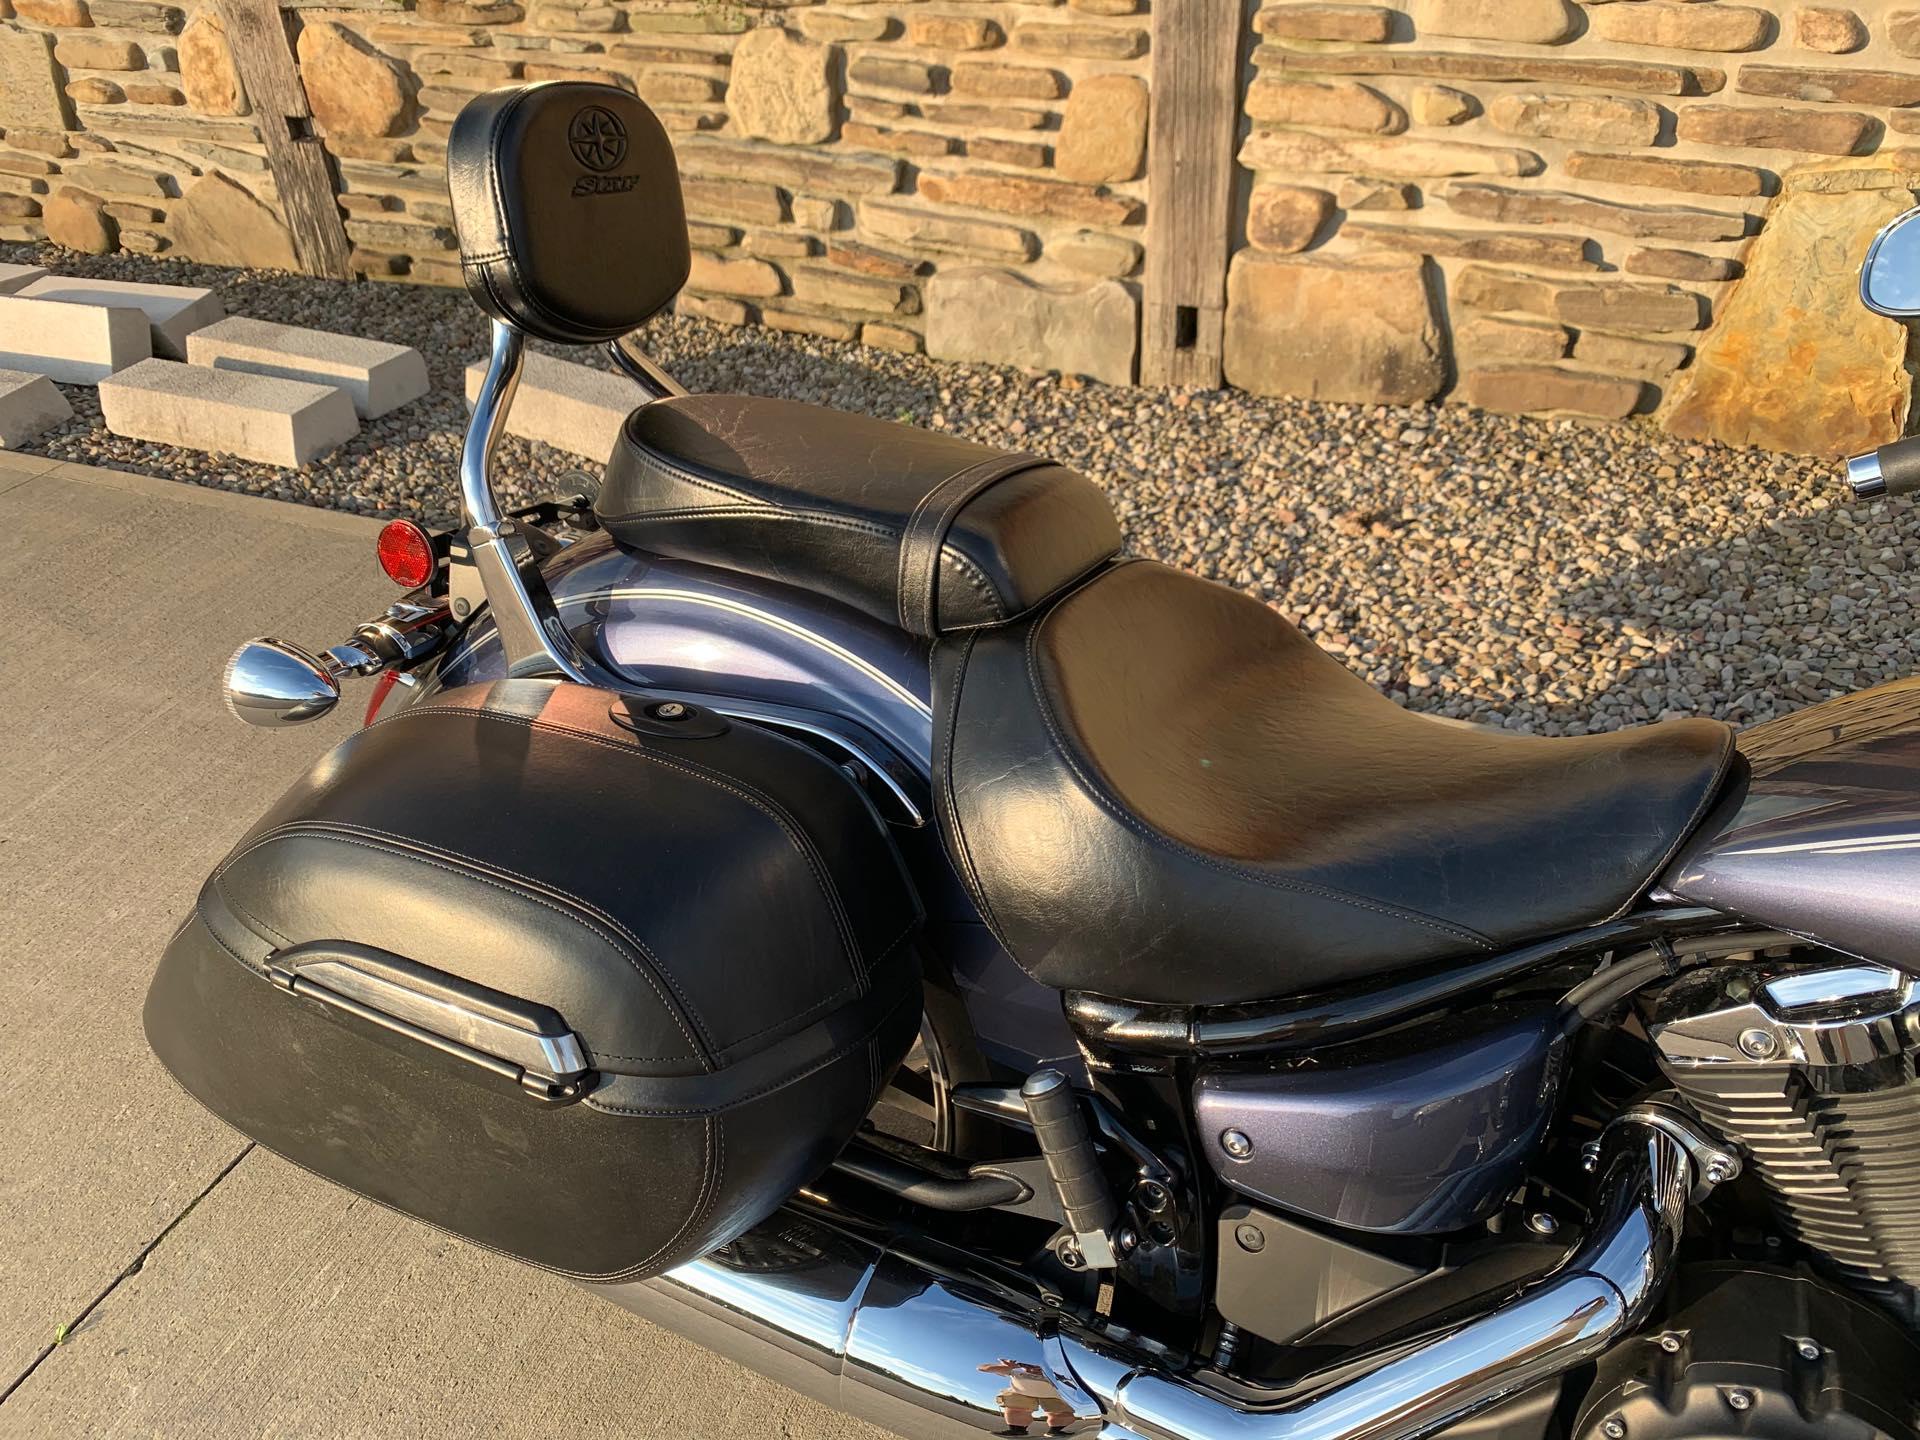 2015 Yamaha V Star 1300 Tourer at Arkport Cycles